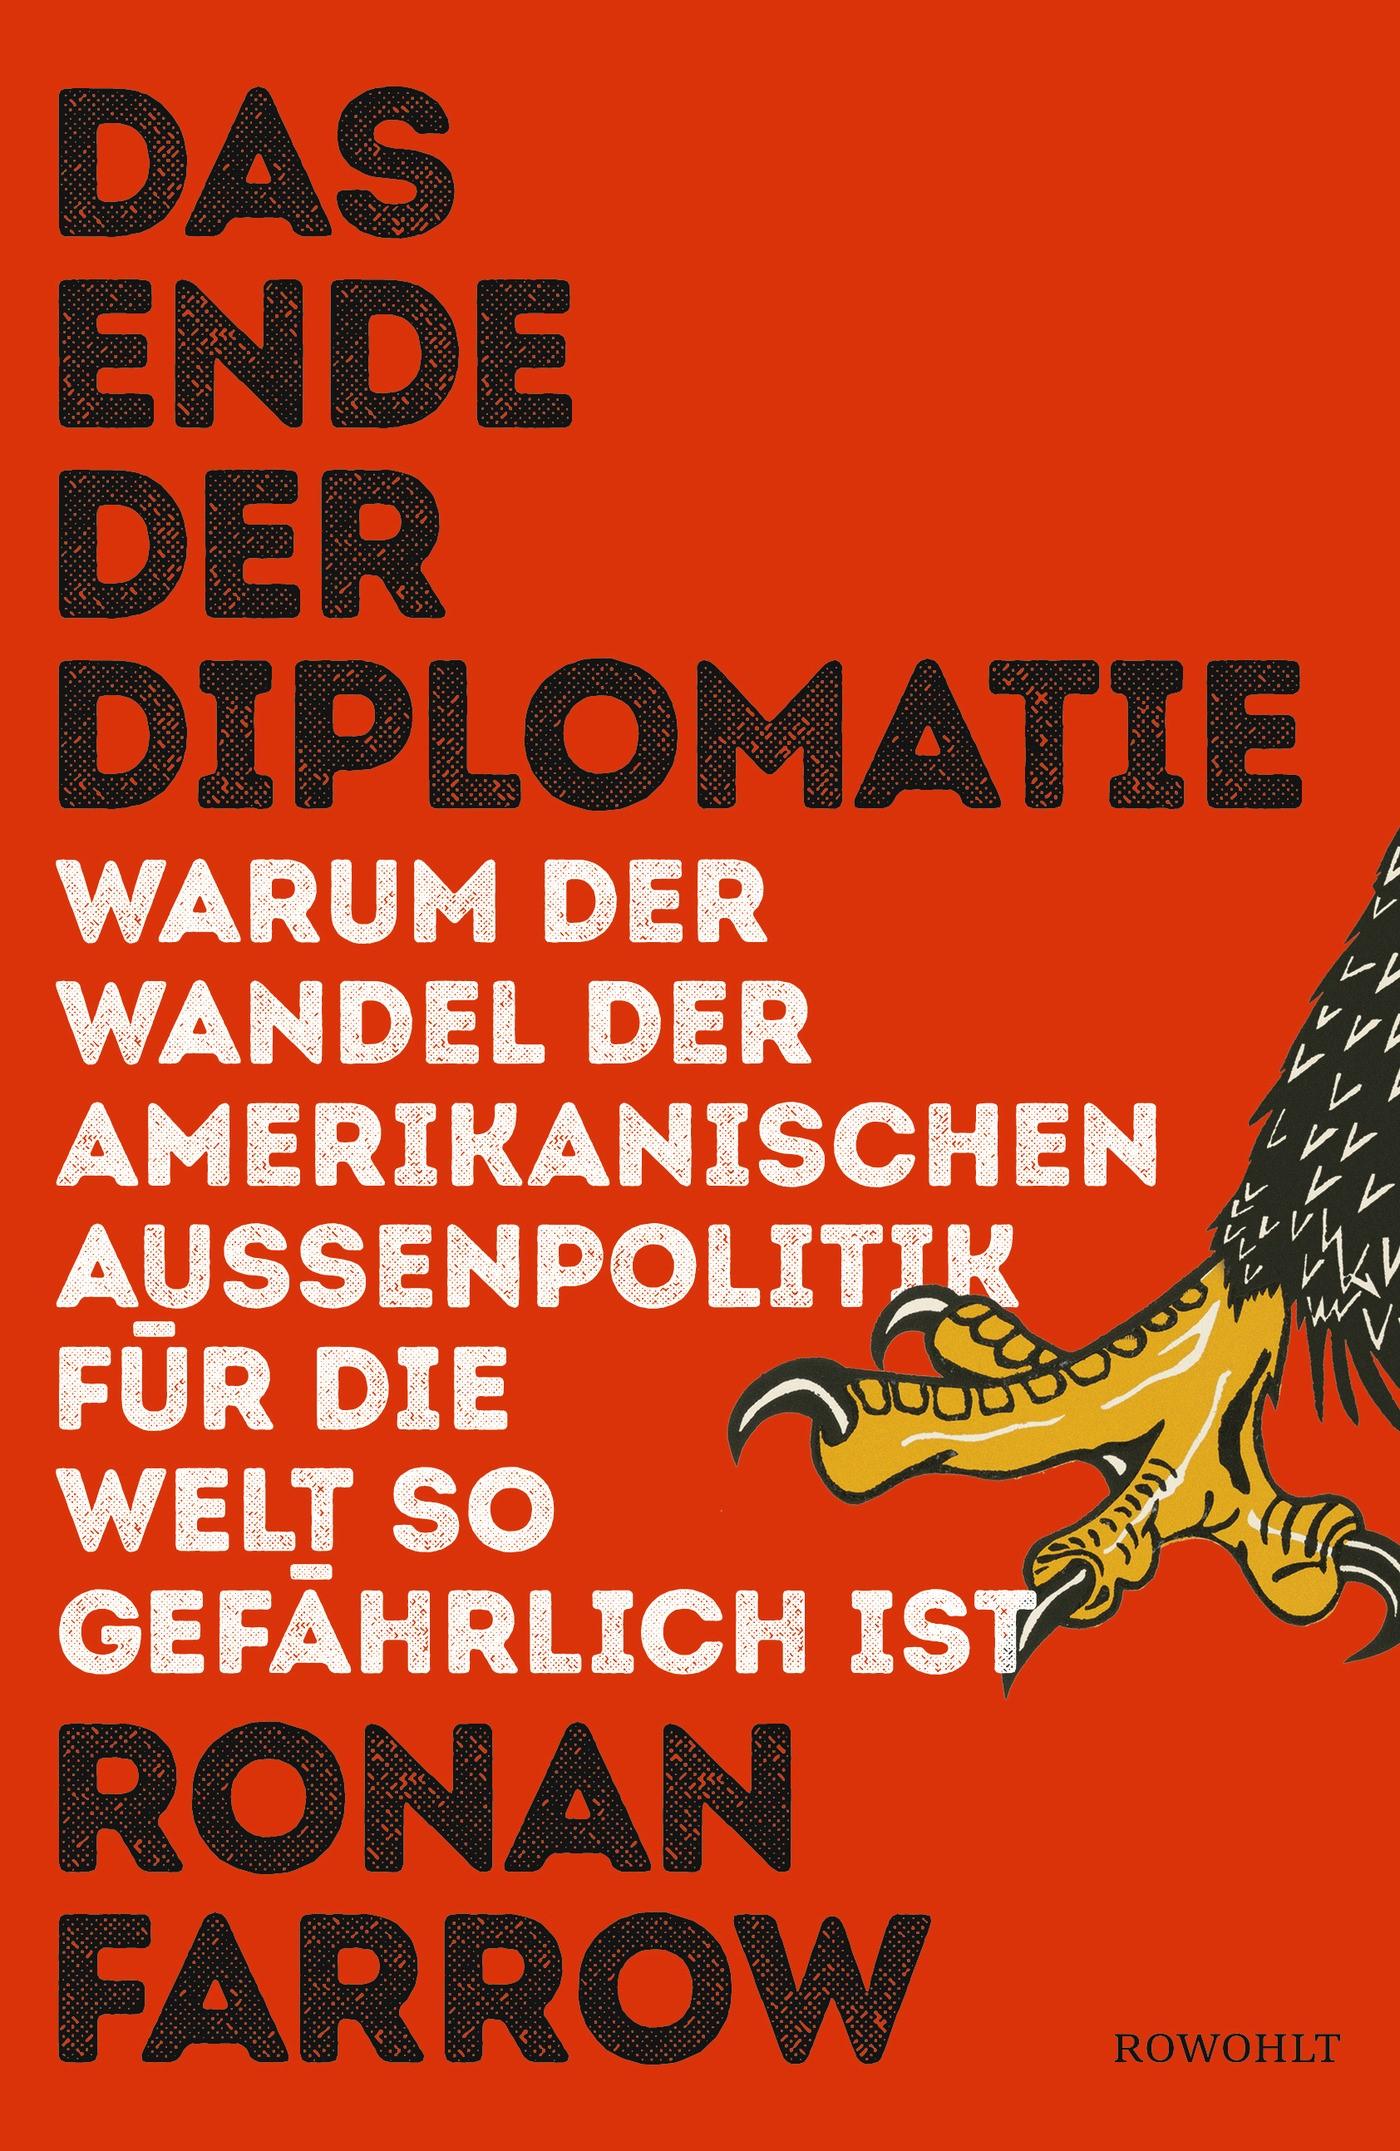 Das Ende der Diplomatie | Farrow, 2018 | Buch (Cover)